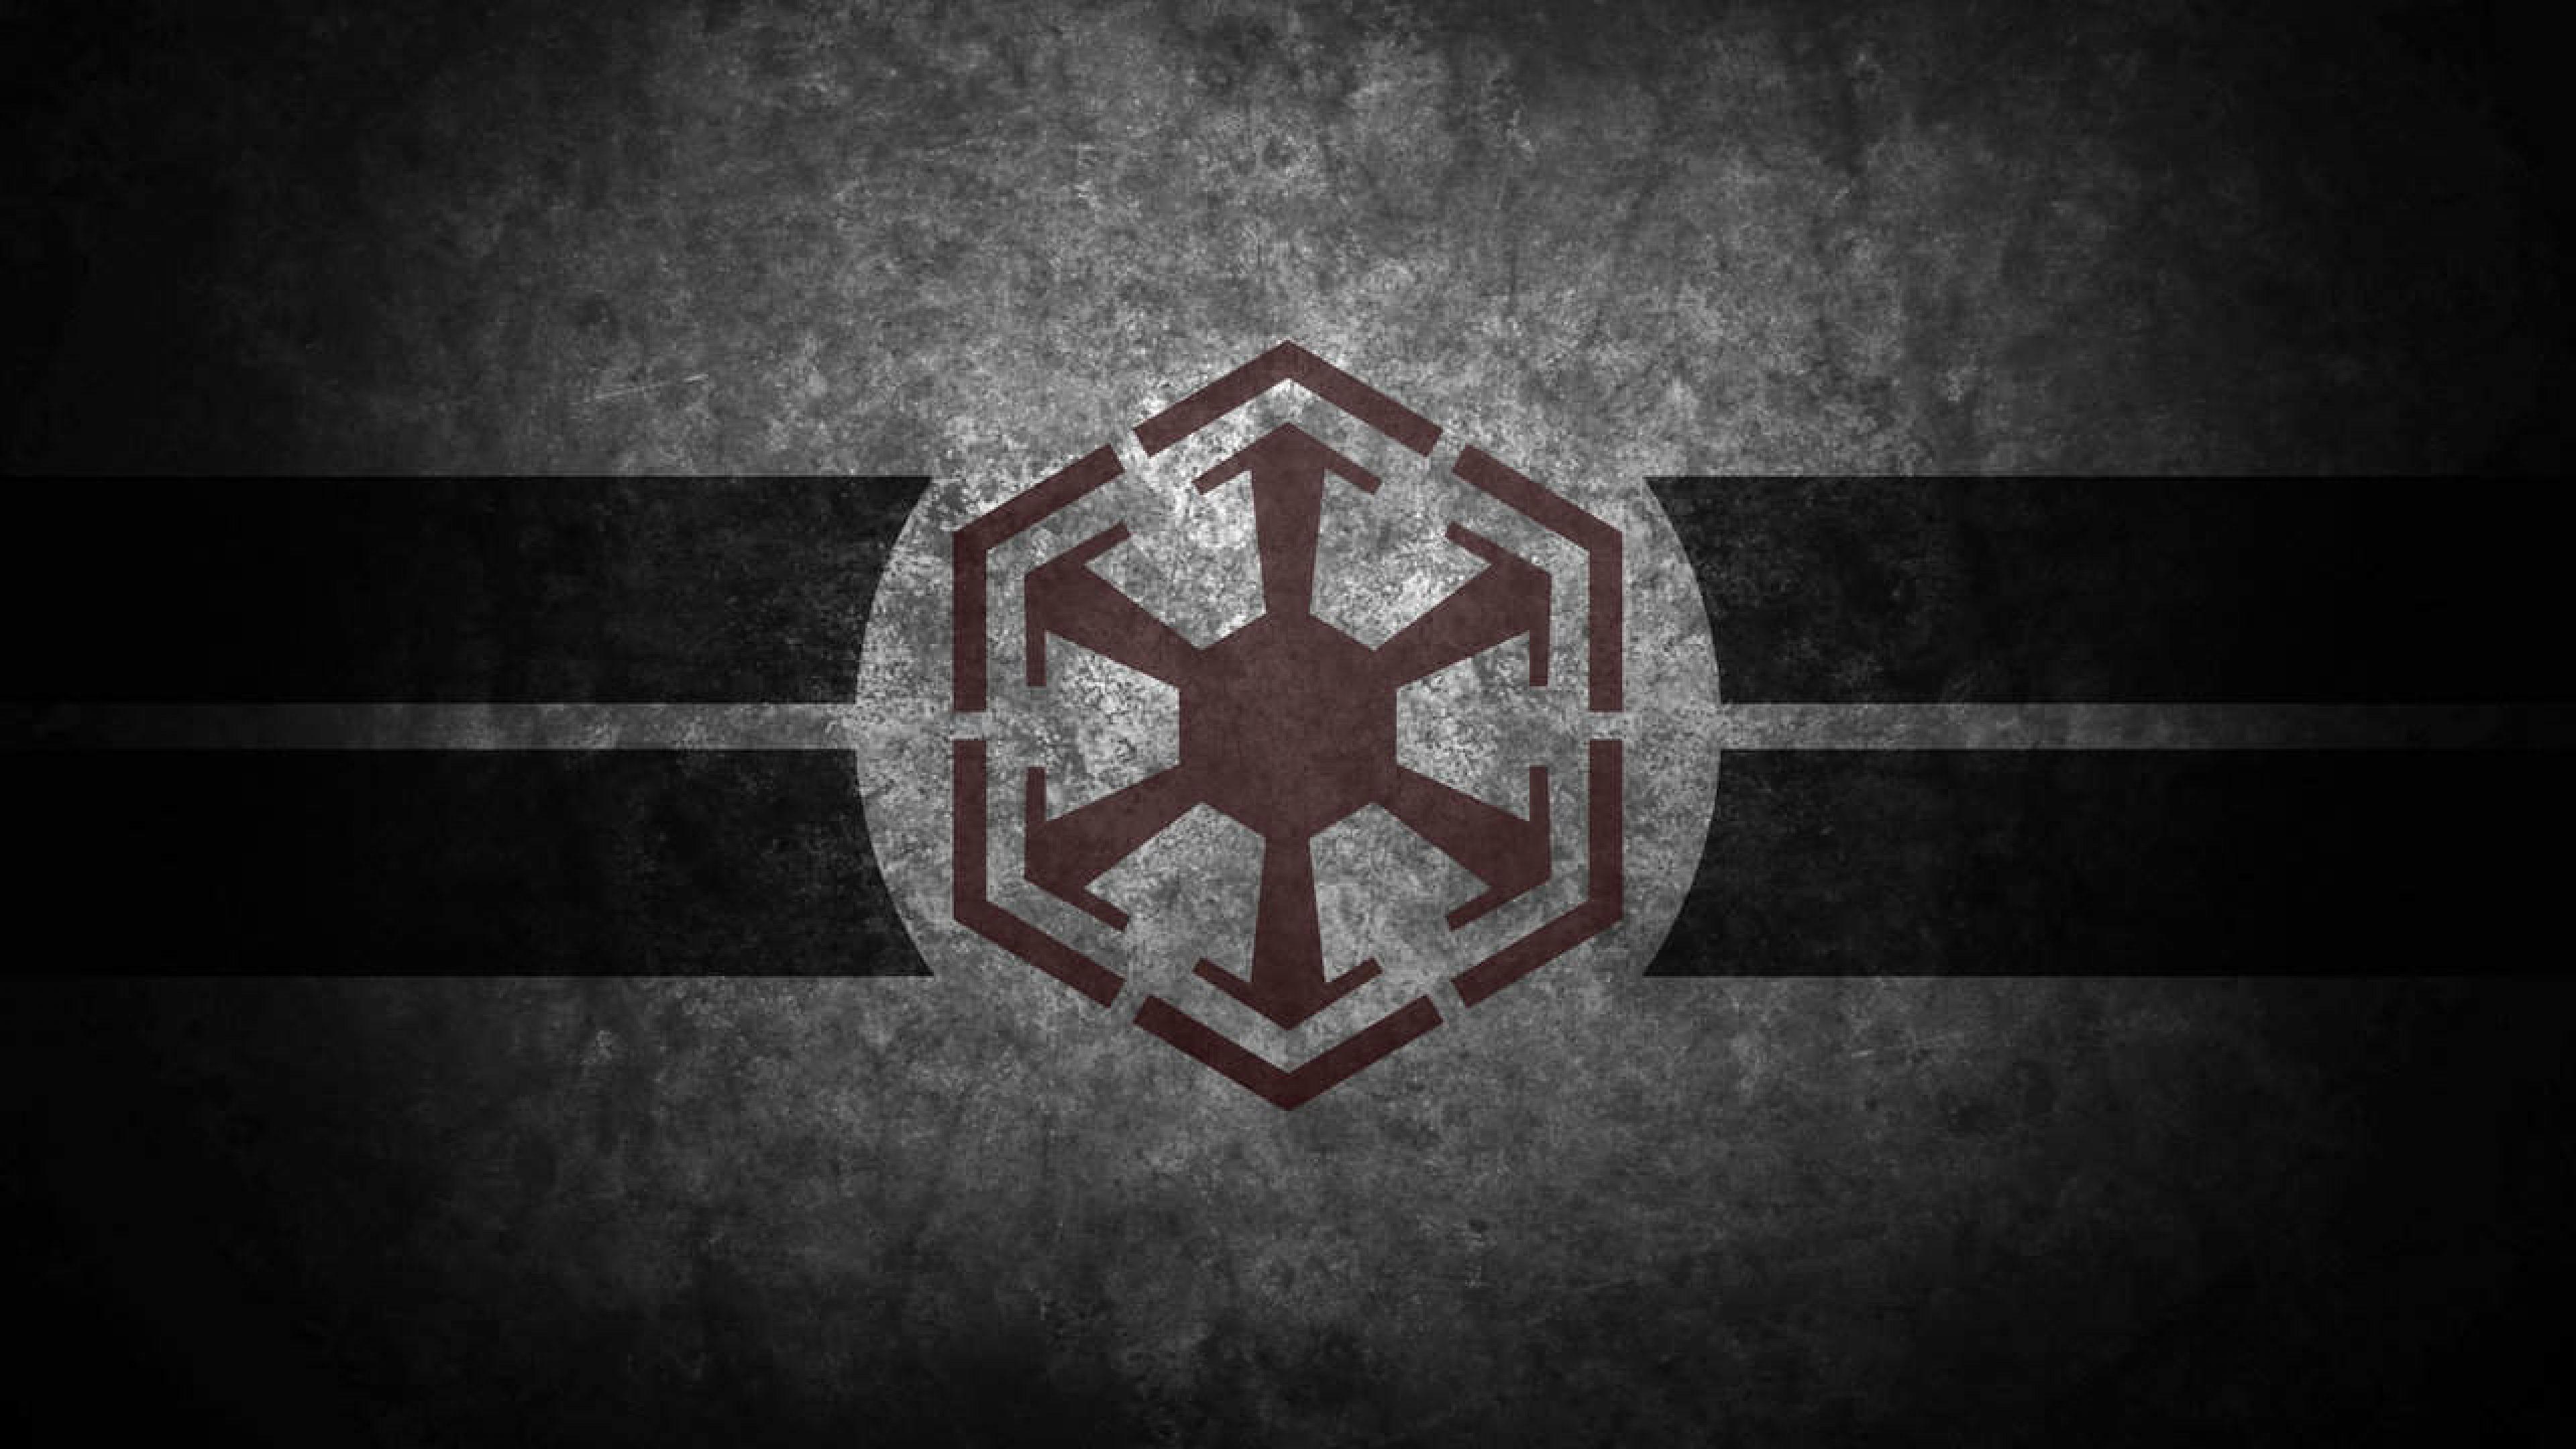 star wars sith empire wallpaper